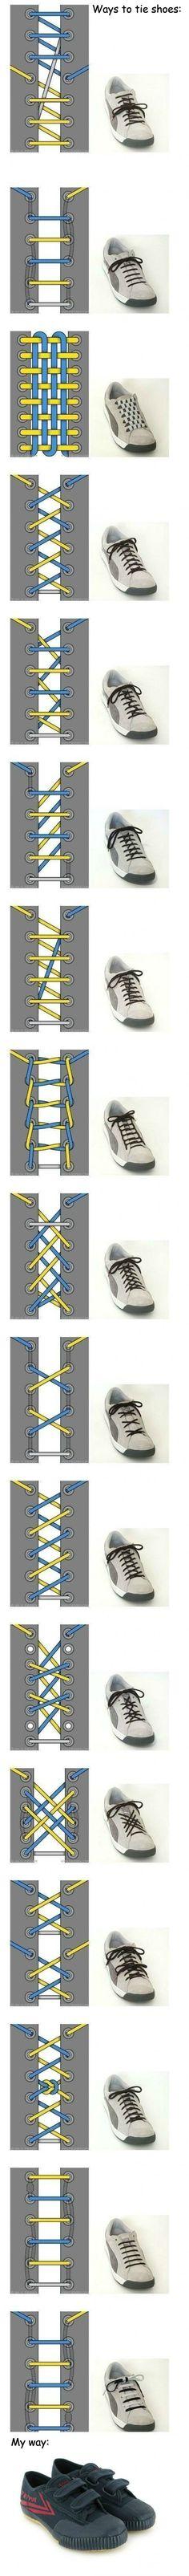 ways to tie your shoe - Imgur